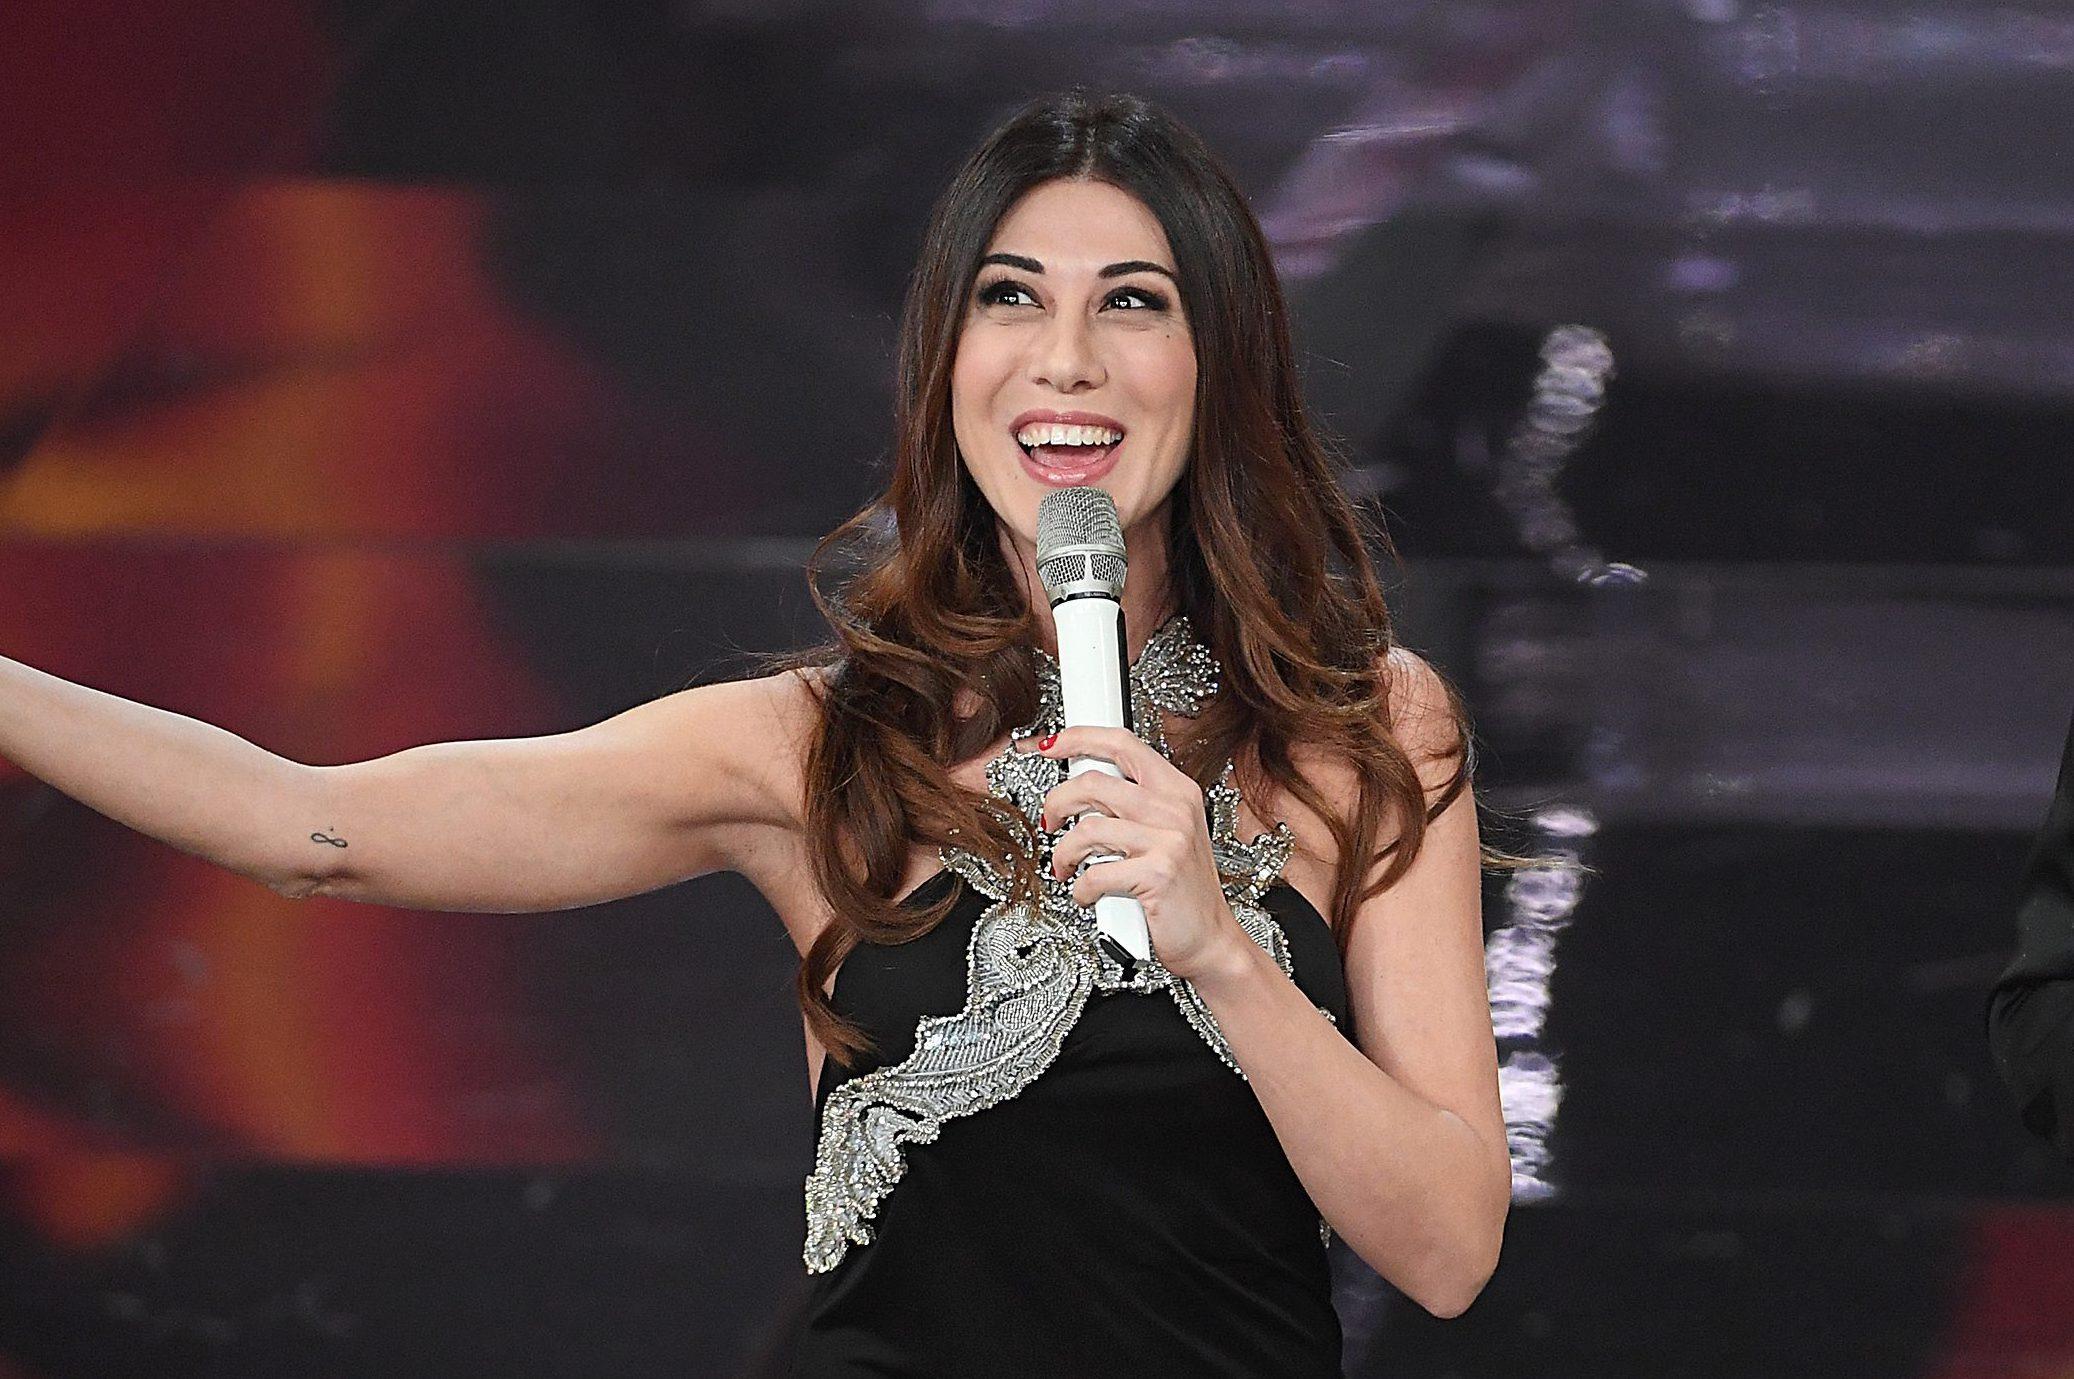 Look Sanremo 2019: cosa indosserà Virginia Raffaele?